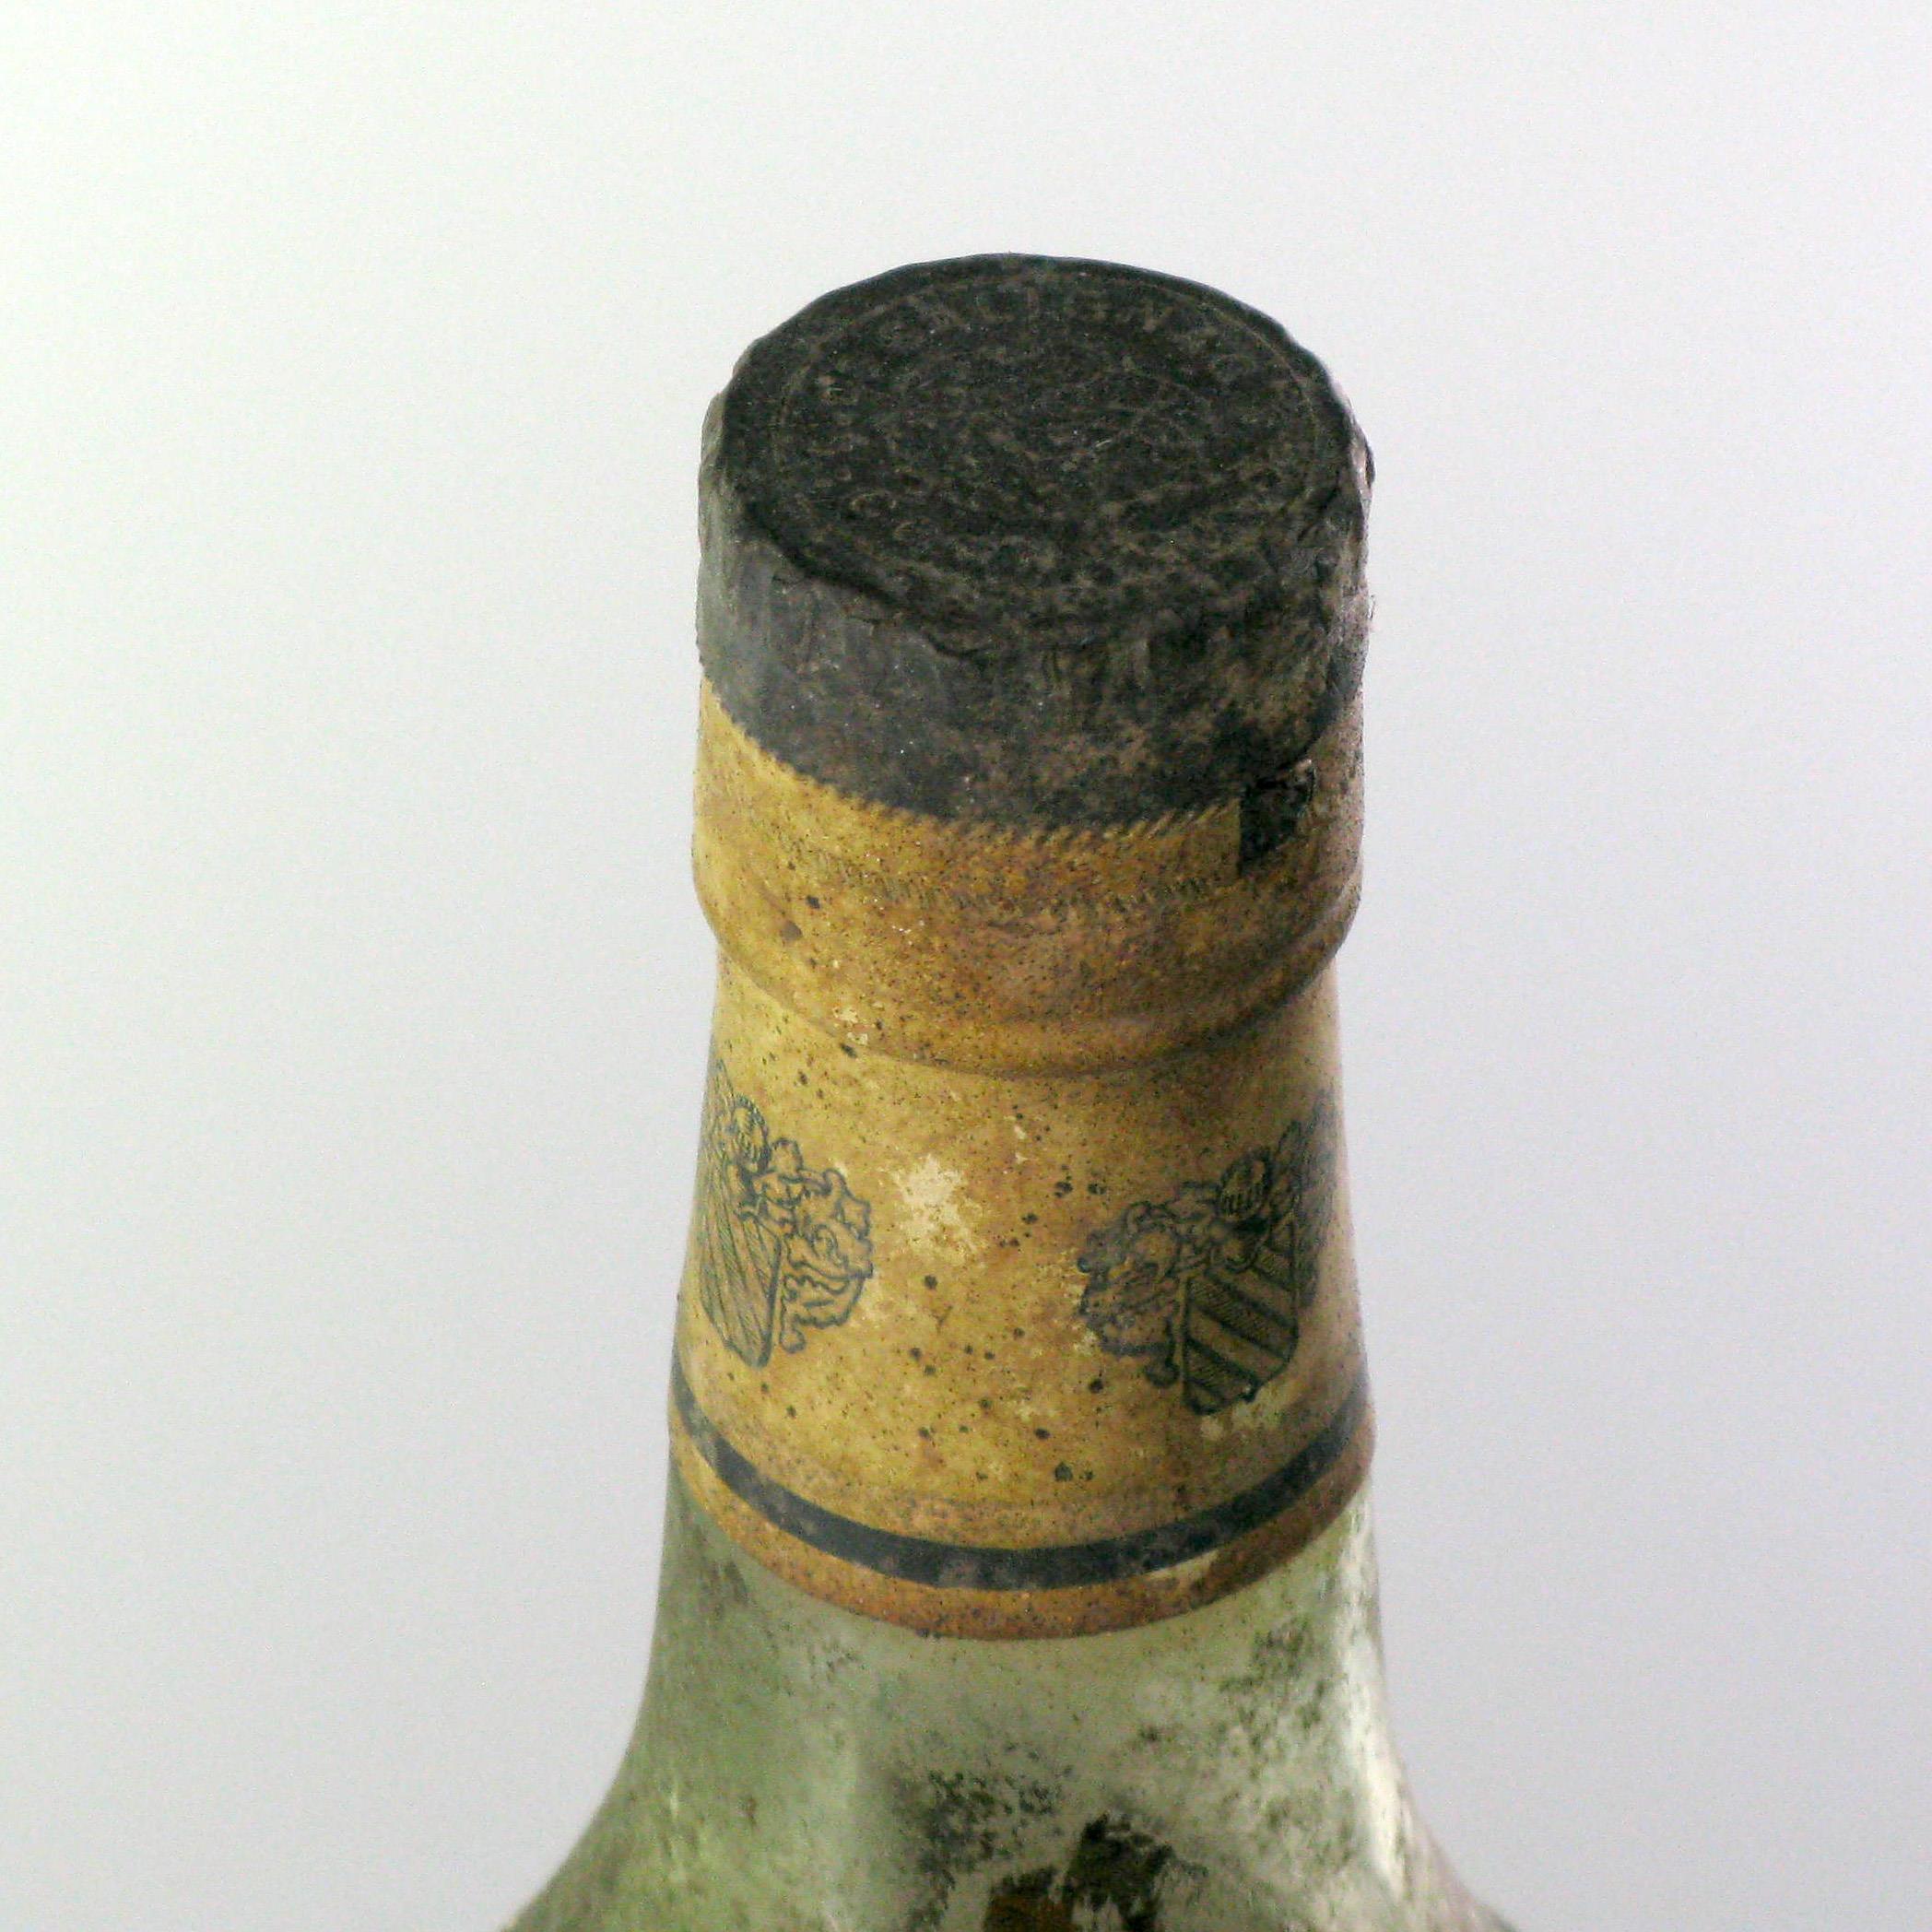 Cognac NV Salignac & Co L. de